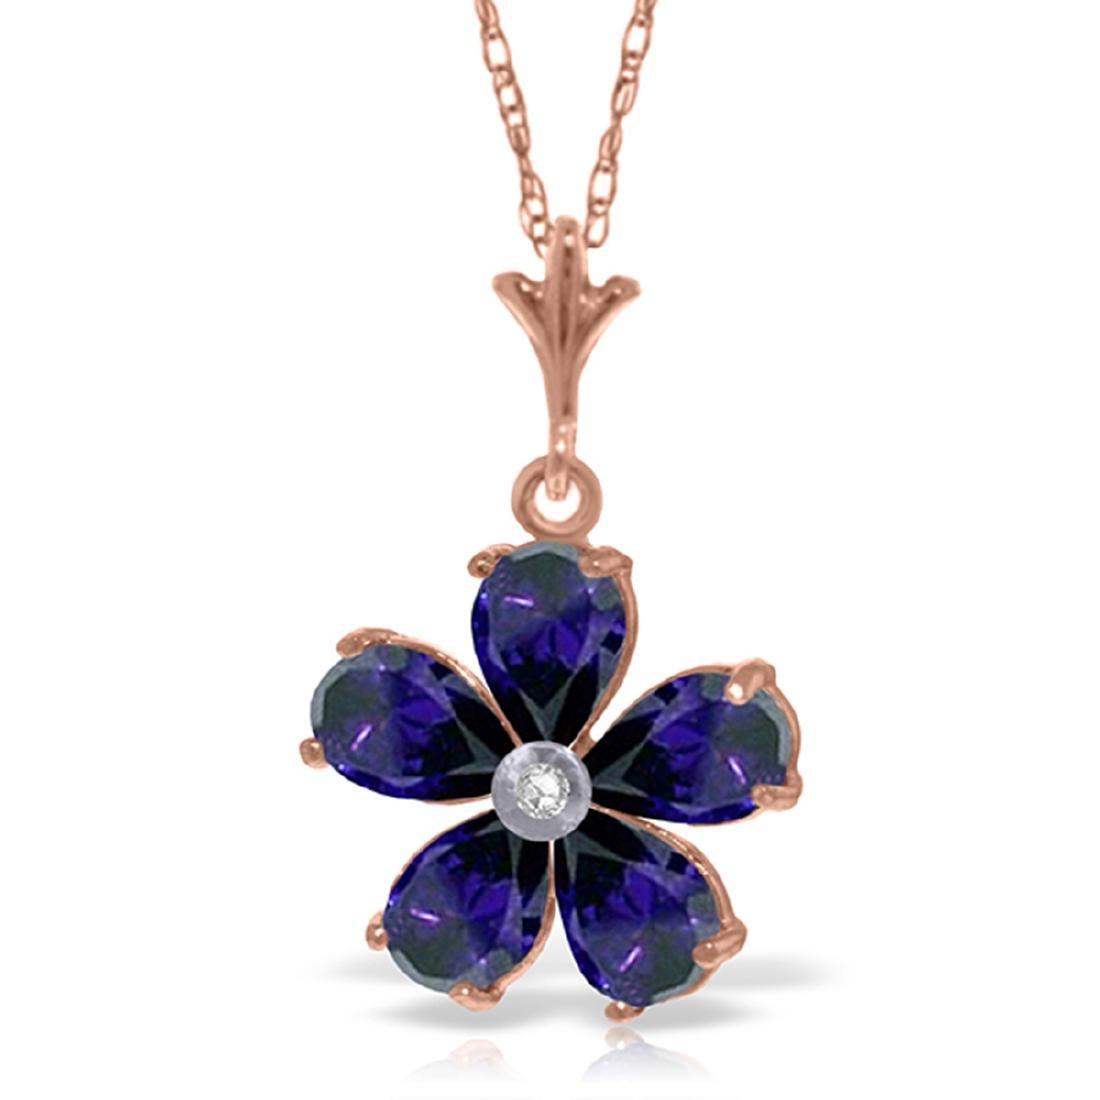 Genuine 2.22 ctw Sapphire & Diamond Necklace Jewelry